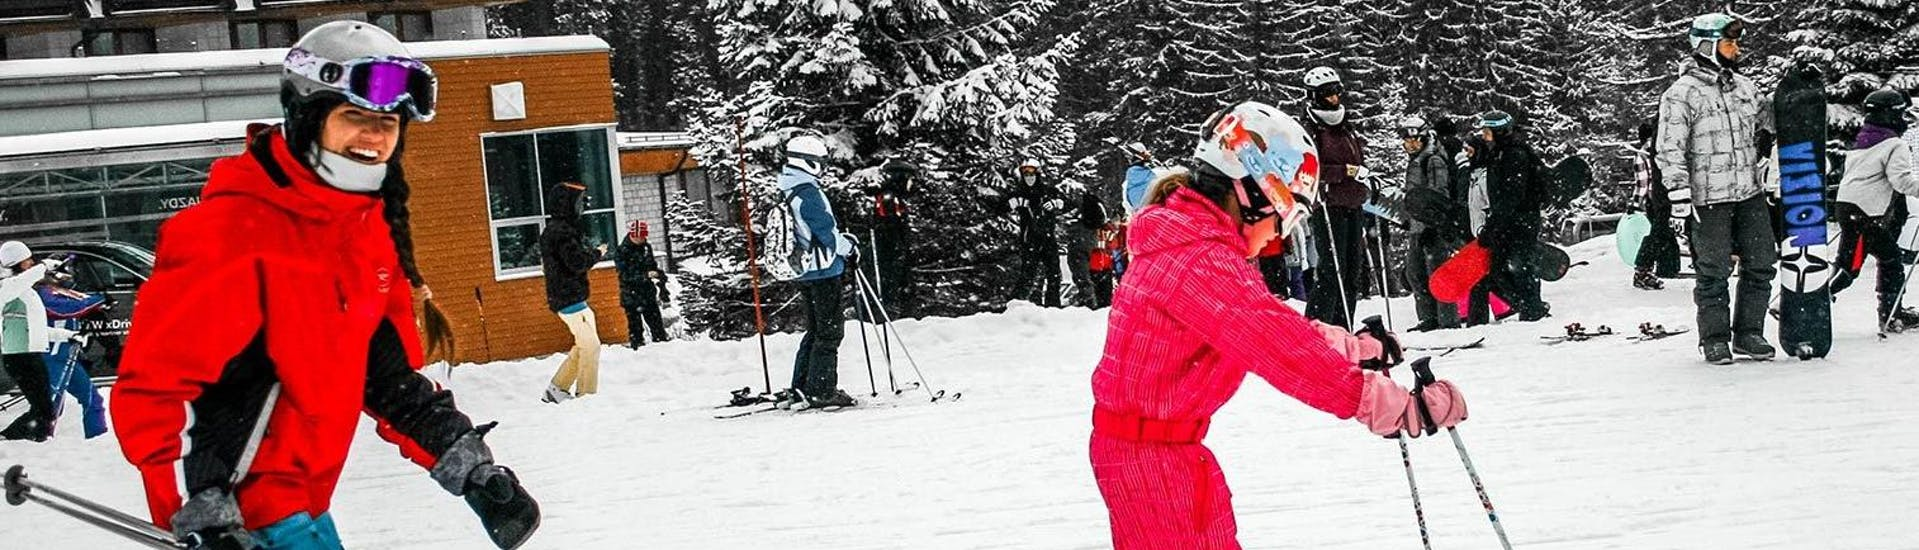 private-ski-lessons-for-kids-all-levels-crystal-ski-hero1